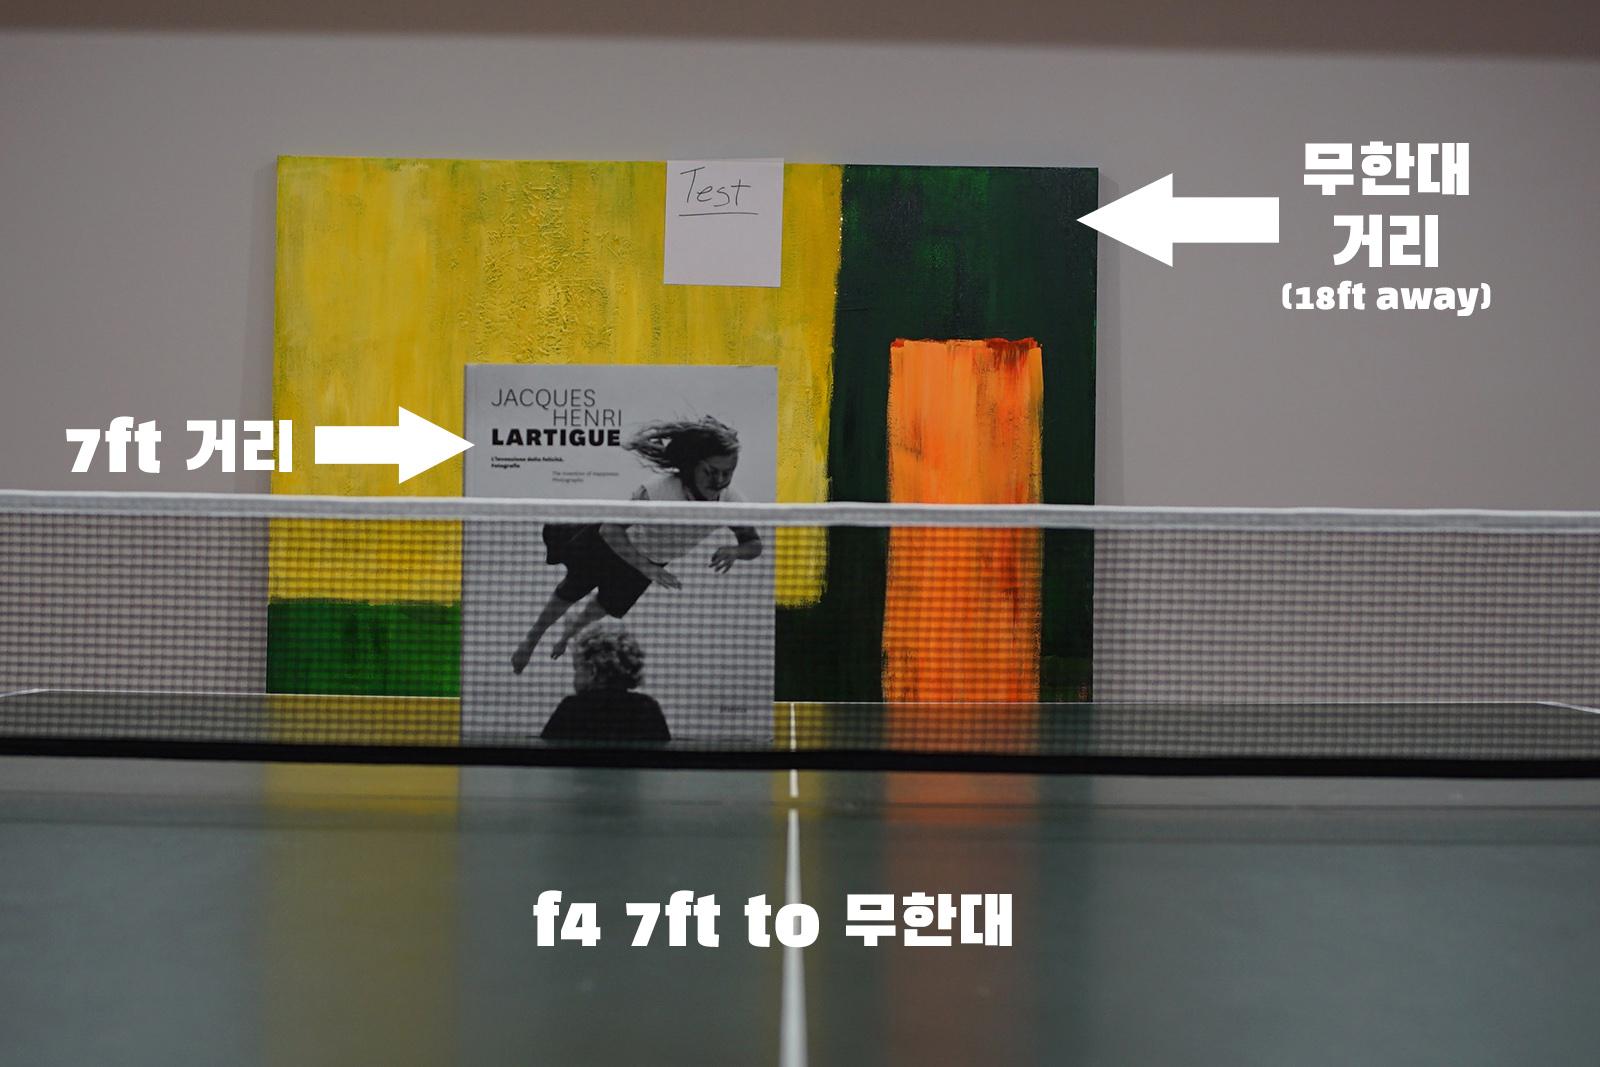 f4 7ft to infinity.jpg